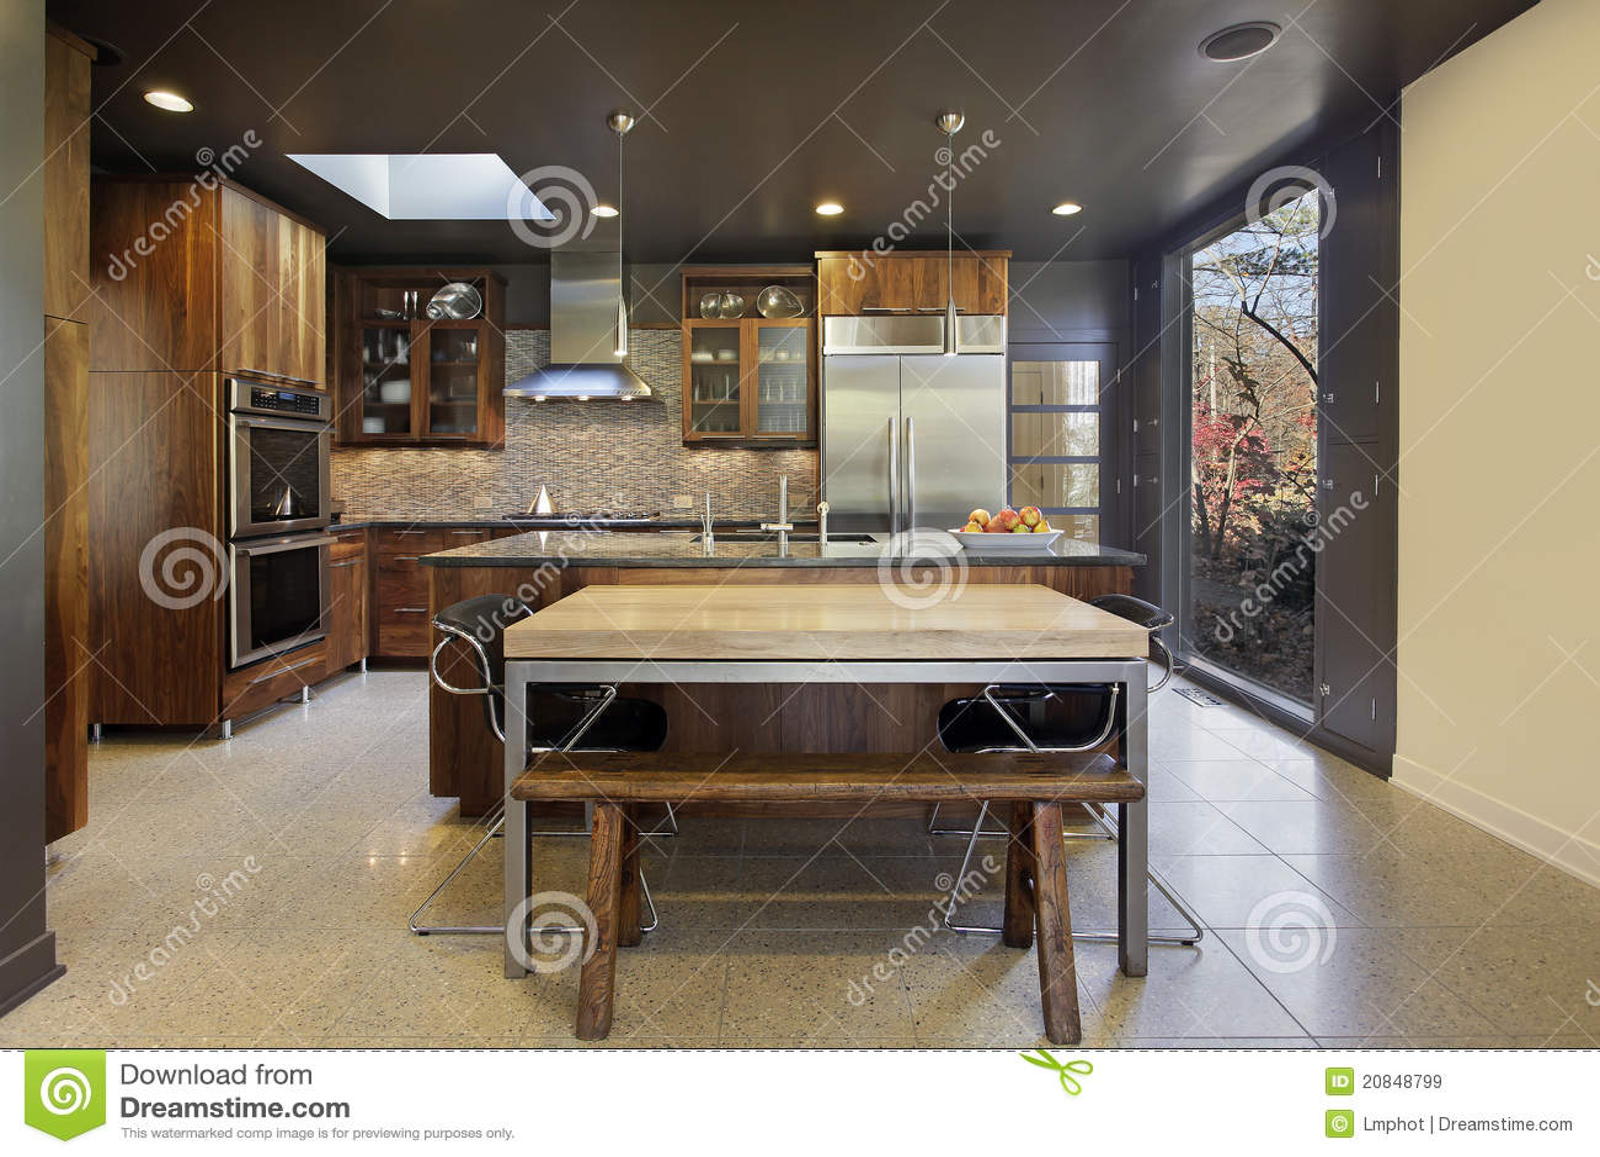 Cucina moderna con la grande finestra panoramica immagine for Cucina moderna con finestra